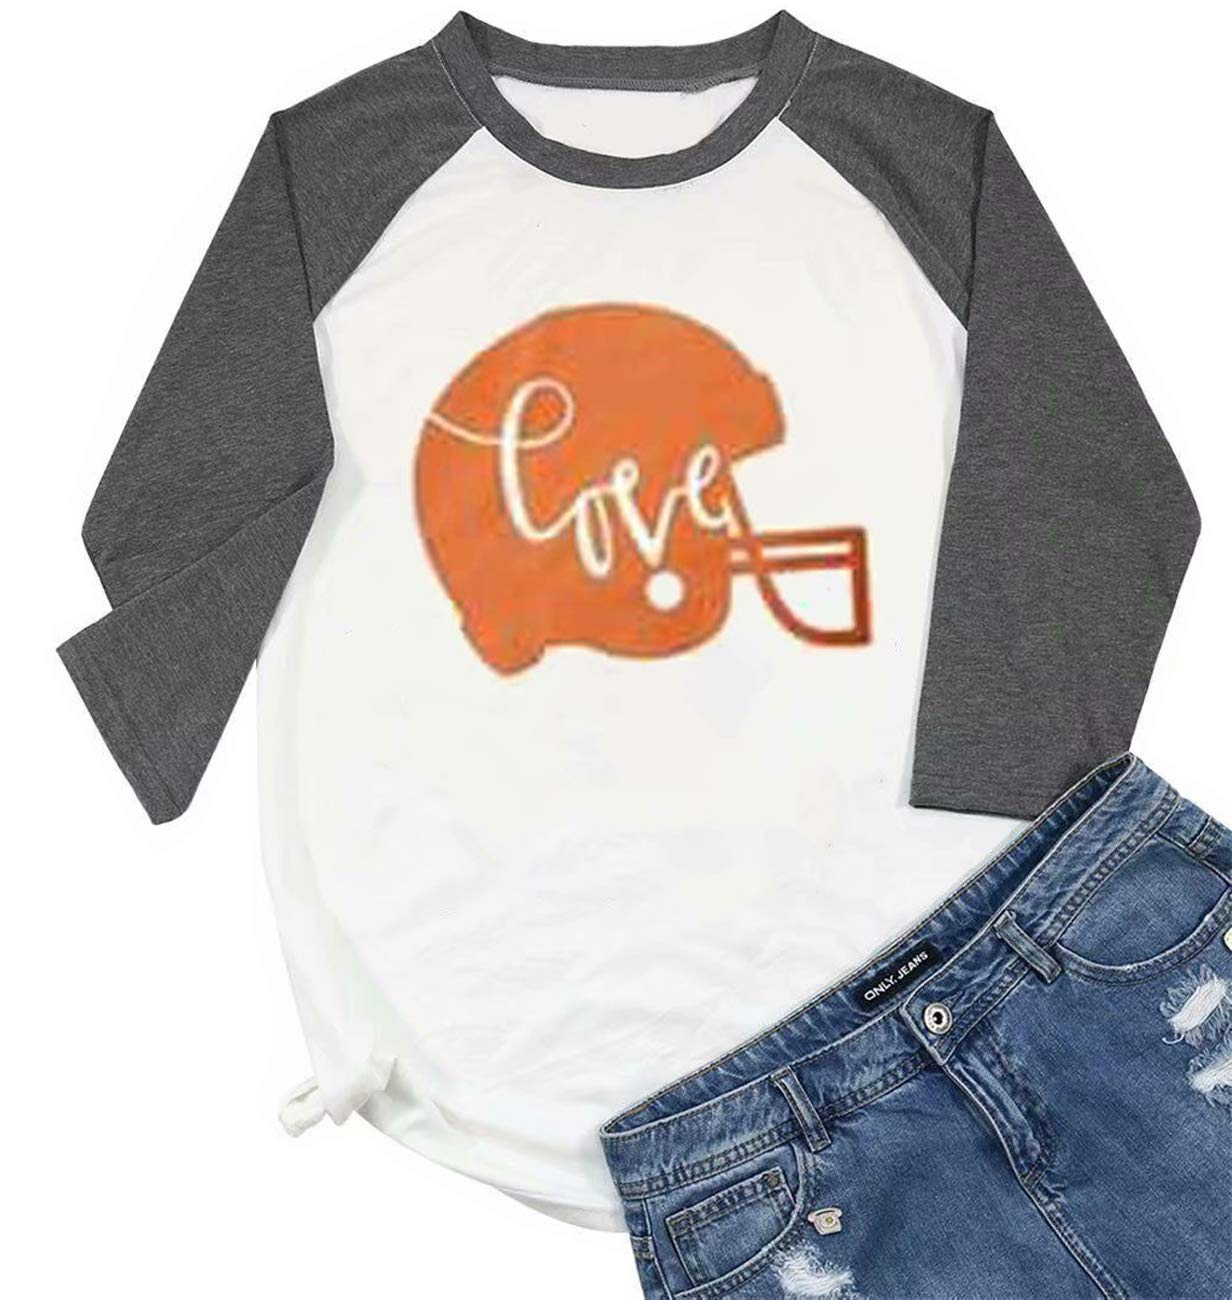 Love Football Funny Helmet Printed T Shirt Women 3/4 Sleeve Raglan Baseball Tees Top Size XXL (White)